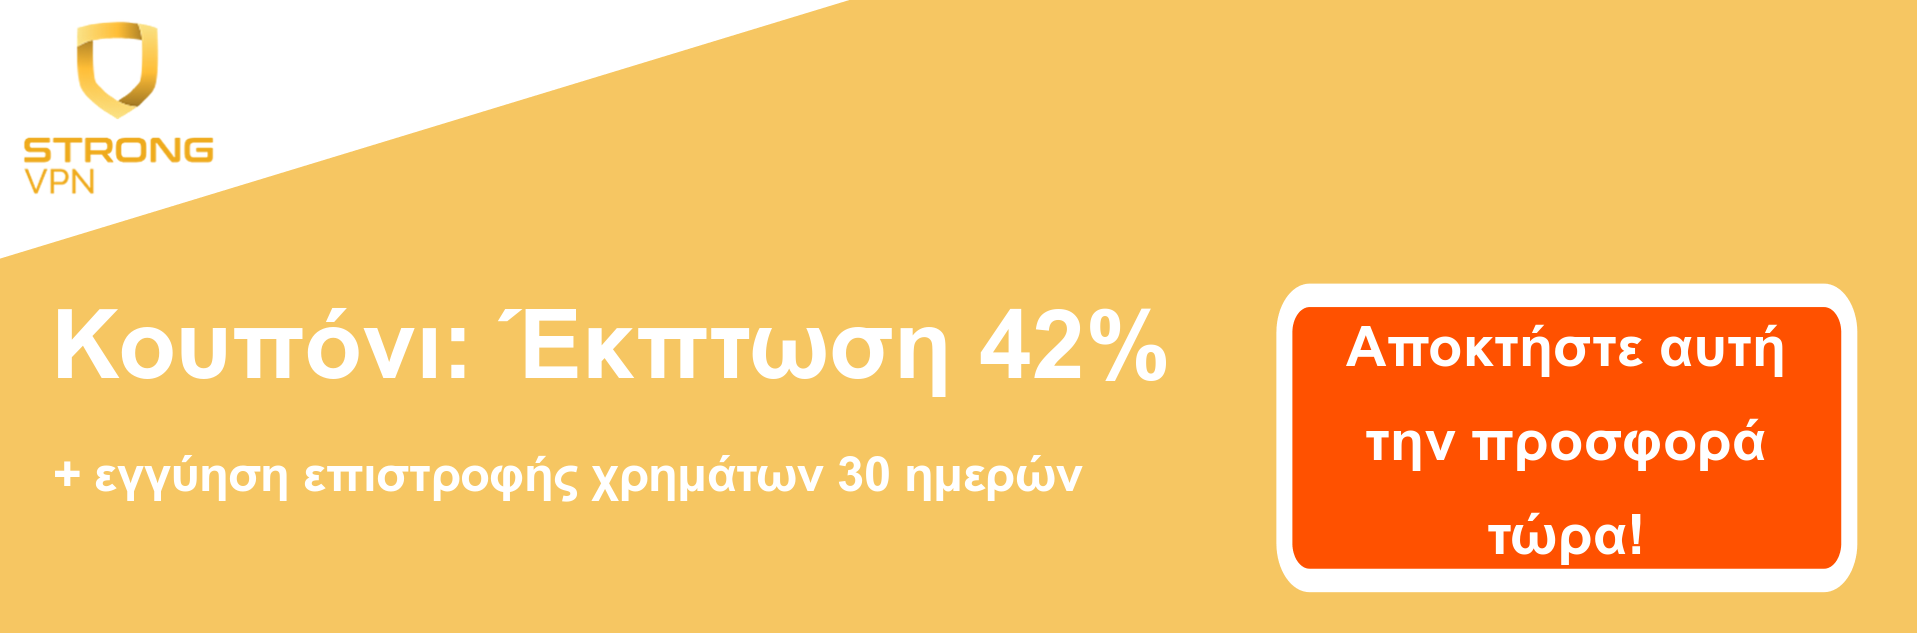 StrongVPN banner κουπονιού - Έκπτωση 42%